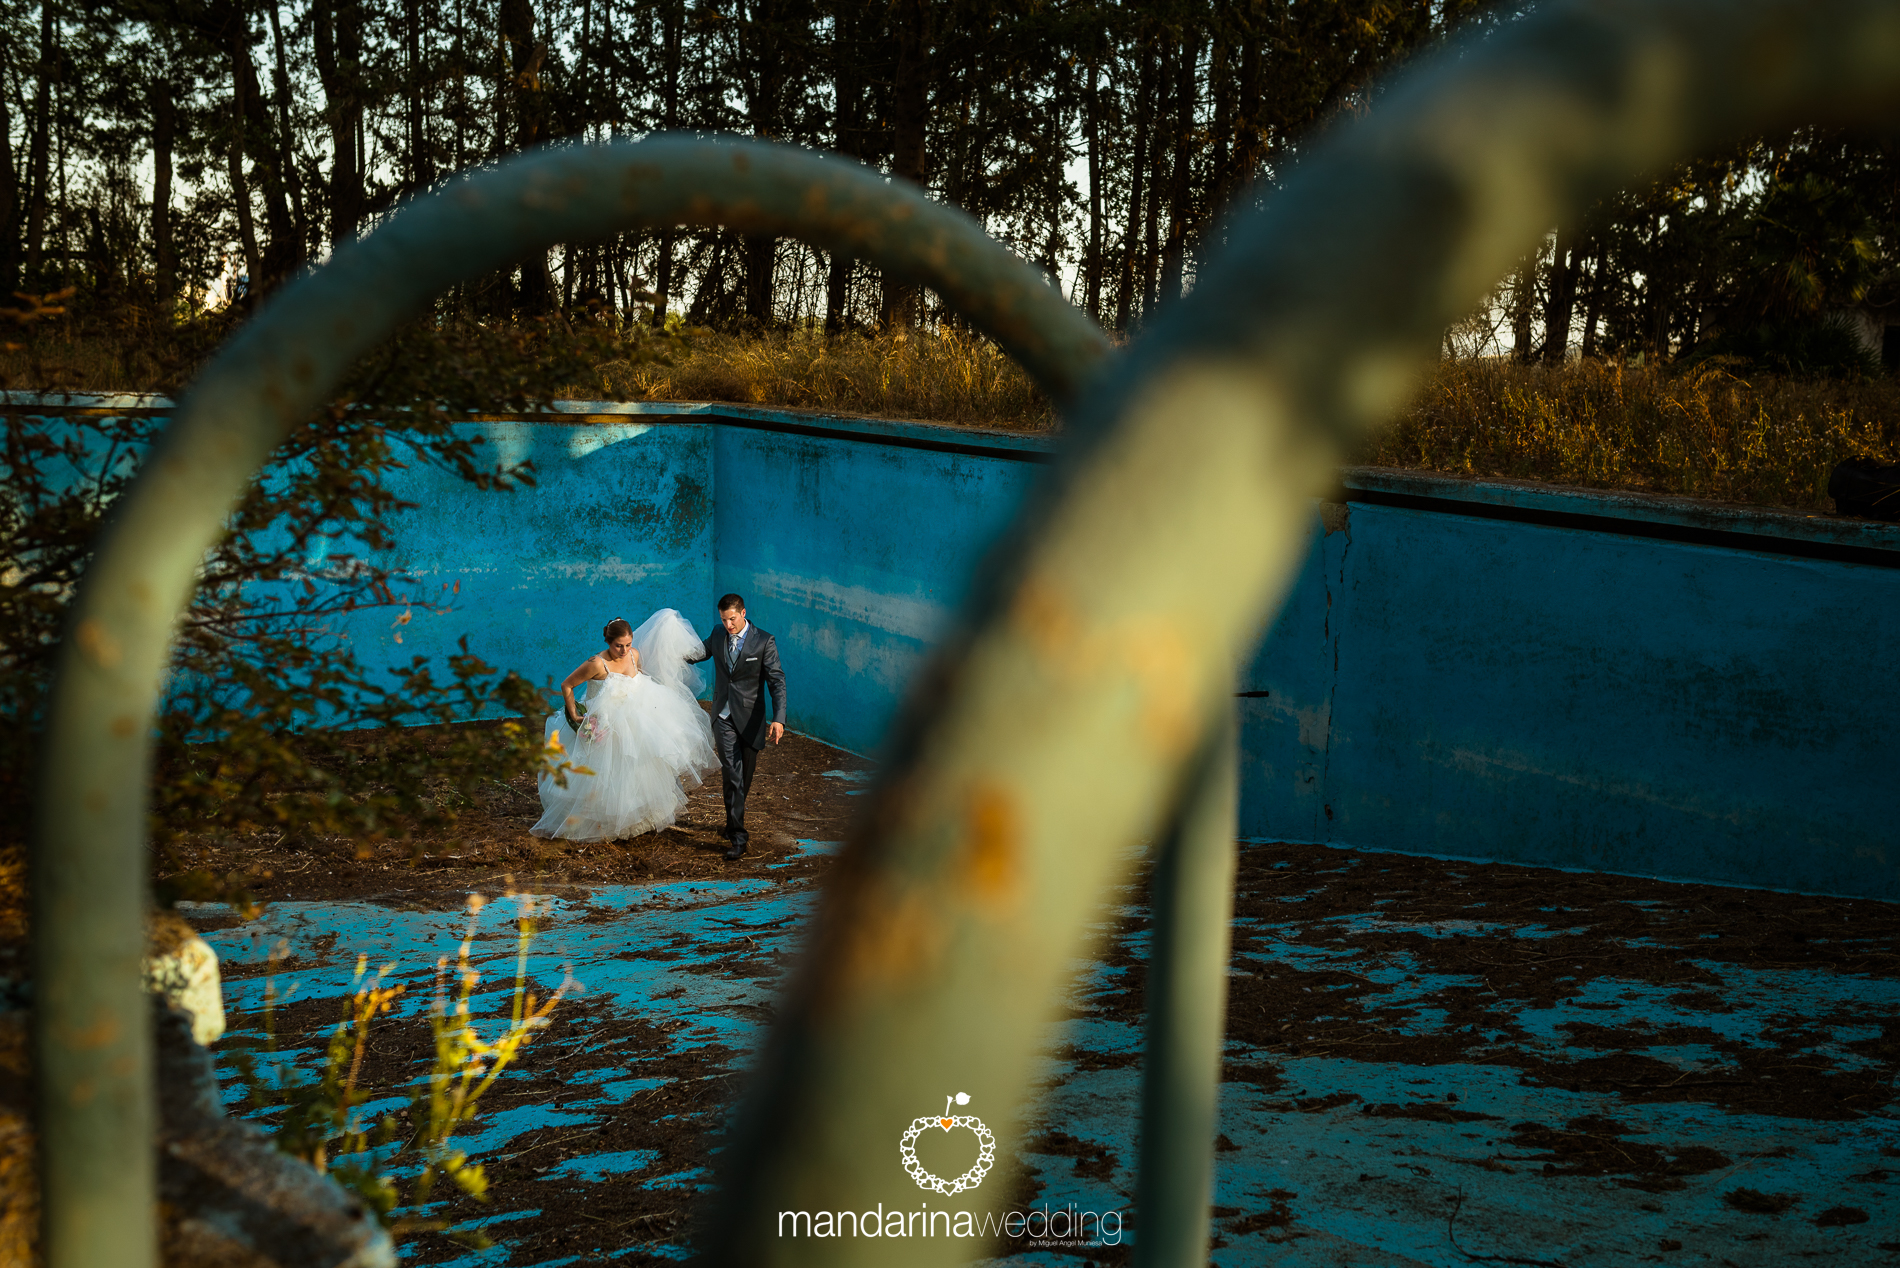 mandarina wedding, mejores fotografos boda, fotografo zaragoza, fotografo huesca, fotografo soria, fotografo lerida_30